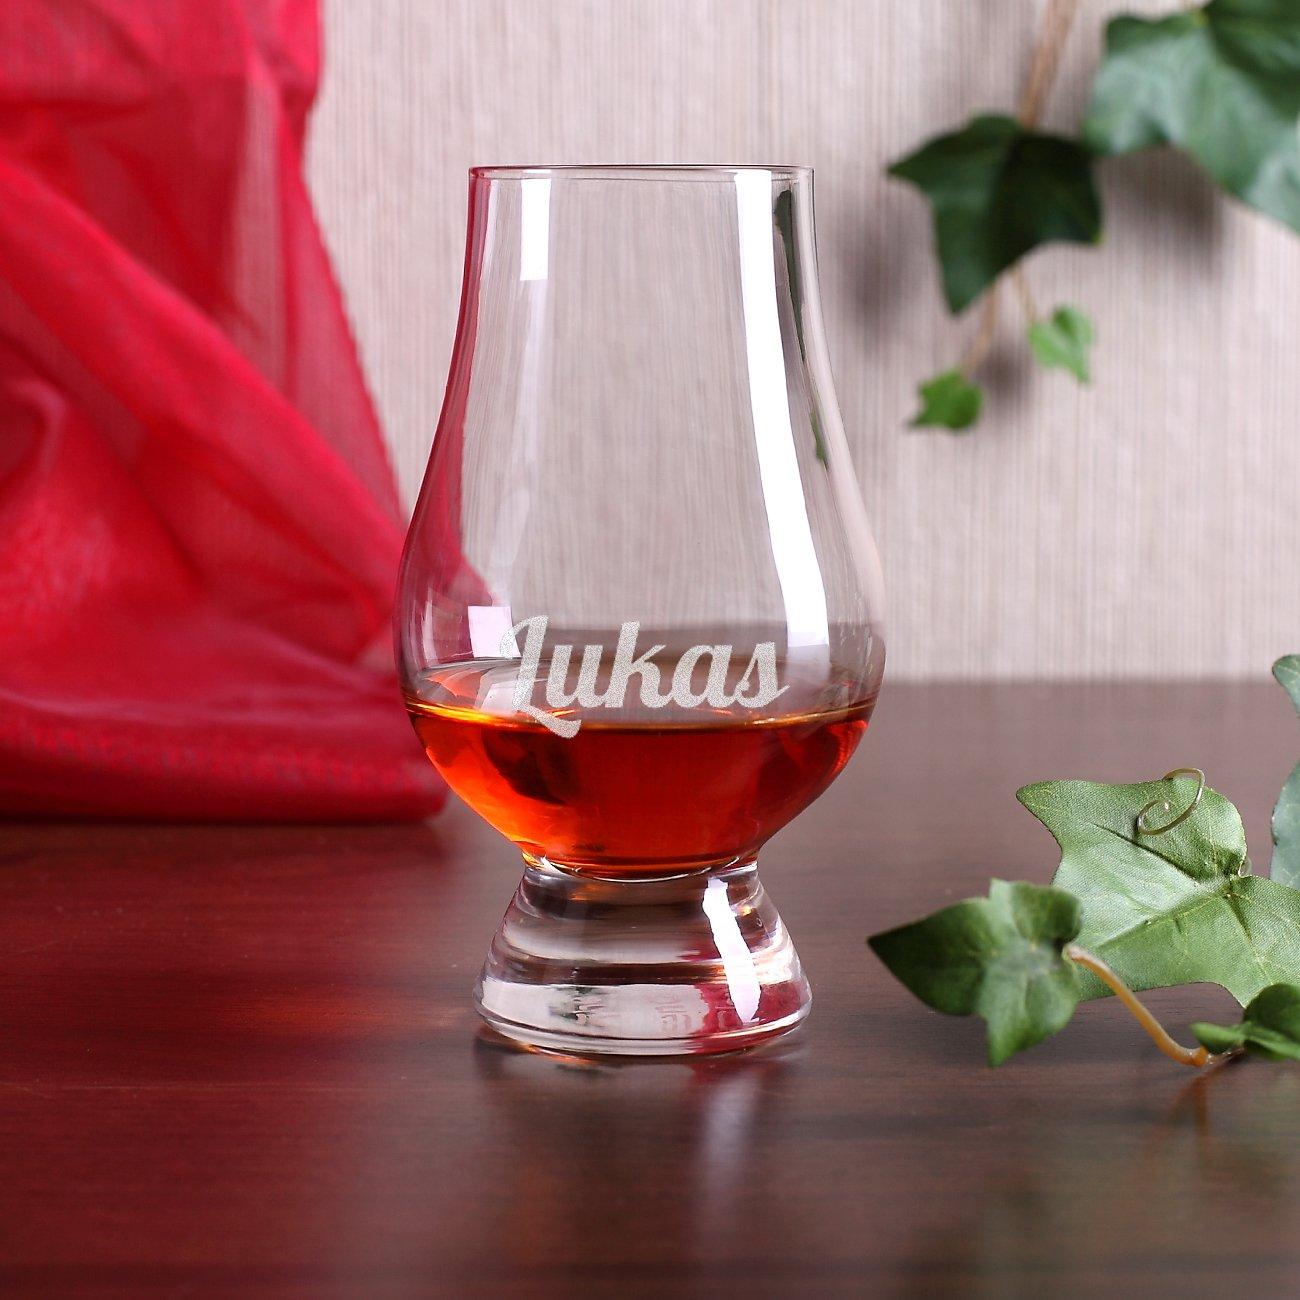 Herz & Heim® 3-tlg. Geschenkset Hennessy Cognac Cognac Cognac mit pers. Beschriftung B00NVULUSC Cognacglser & Schwenker 9ad93a